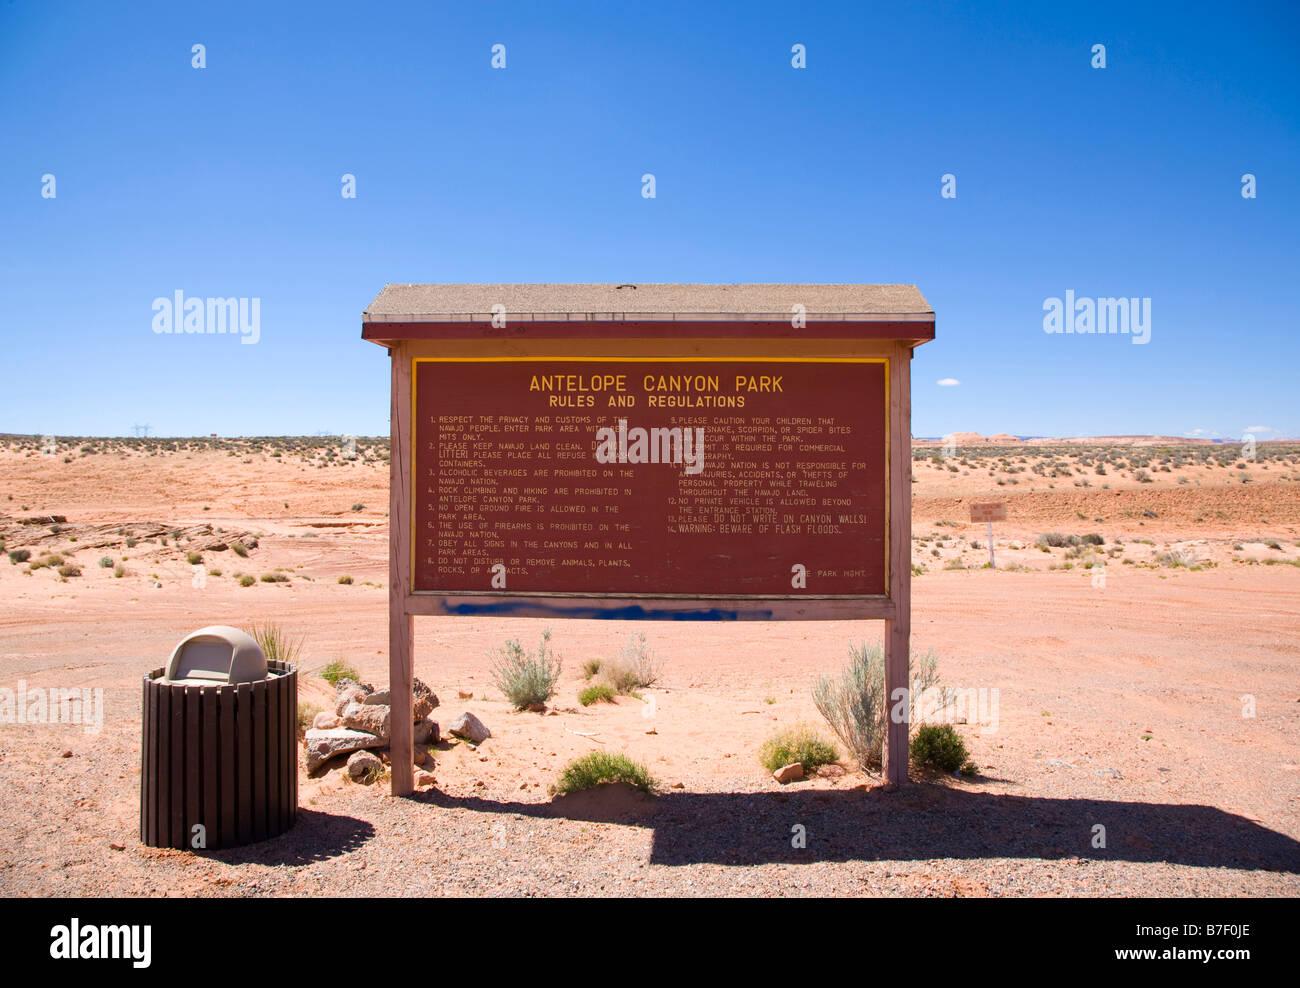 Antelope Canyon rules and regulations sign, Arizona, USA - Stock Image